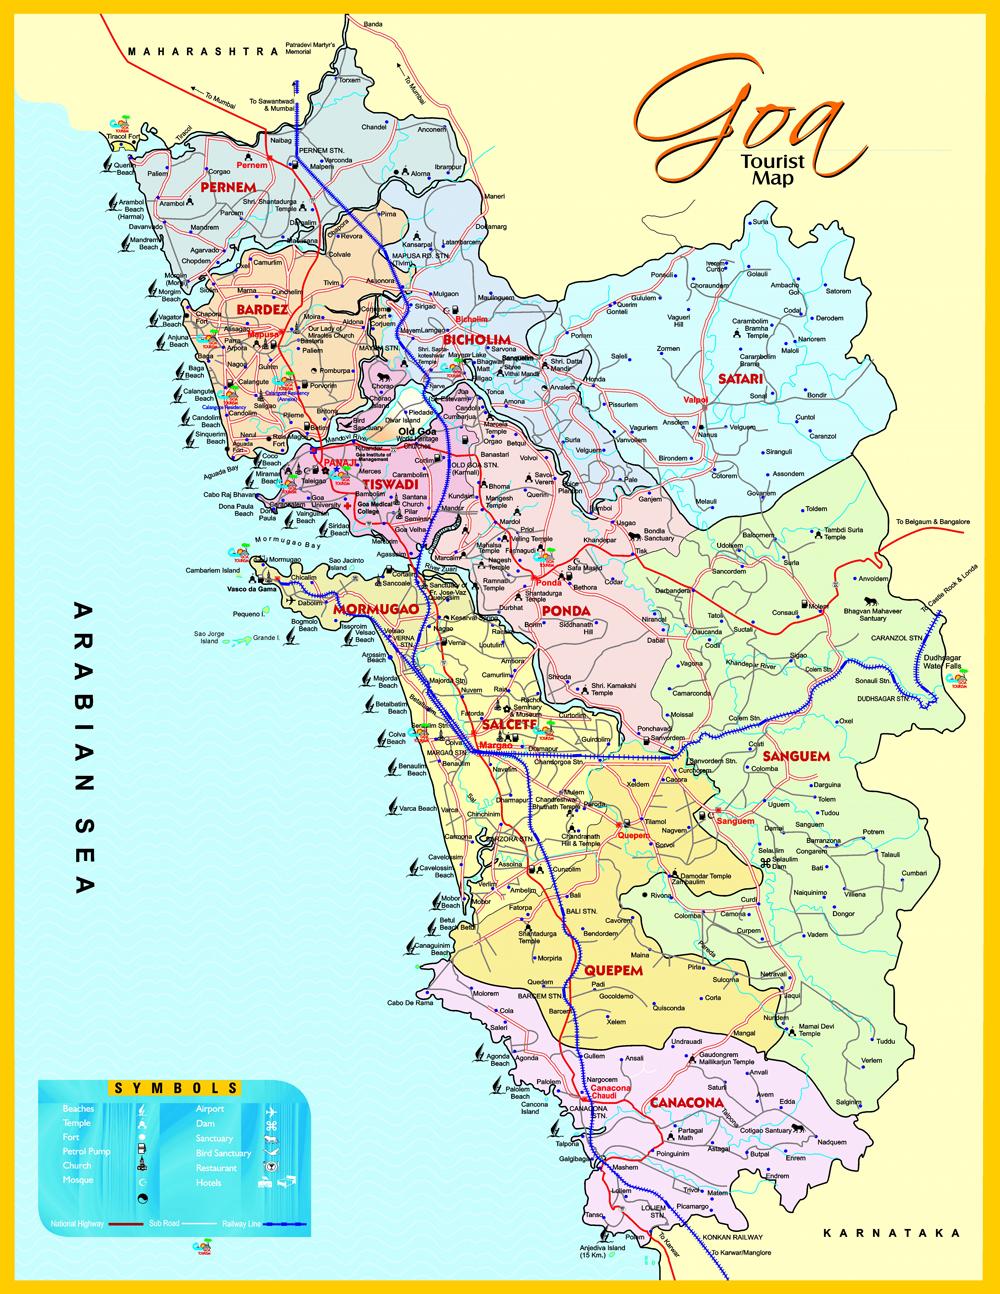 GOA TOURISM MAP / TOURIST PLACES IN GOA / BEACHES IN GOA ... on madras map, vasco da gama, calicut map, mangalore map, states of india, malacca on map, ooty map, bay of bengal map, macau map, new delhi, tamil nadu, kerala map, calcutta map, drass map, road map, lisbon map, cape verde map, canton map, andhra pradesh, cape town map, india map, moluccas map, jammu and kashmir, gujarat map, pune airport map, cadiz map, uttar pradesh,